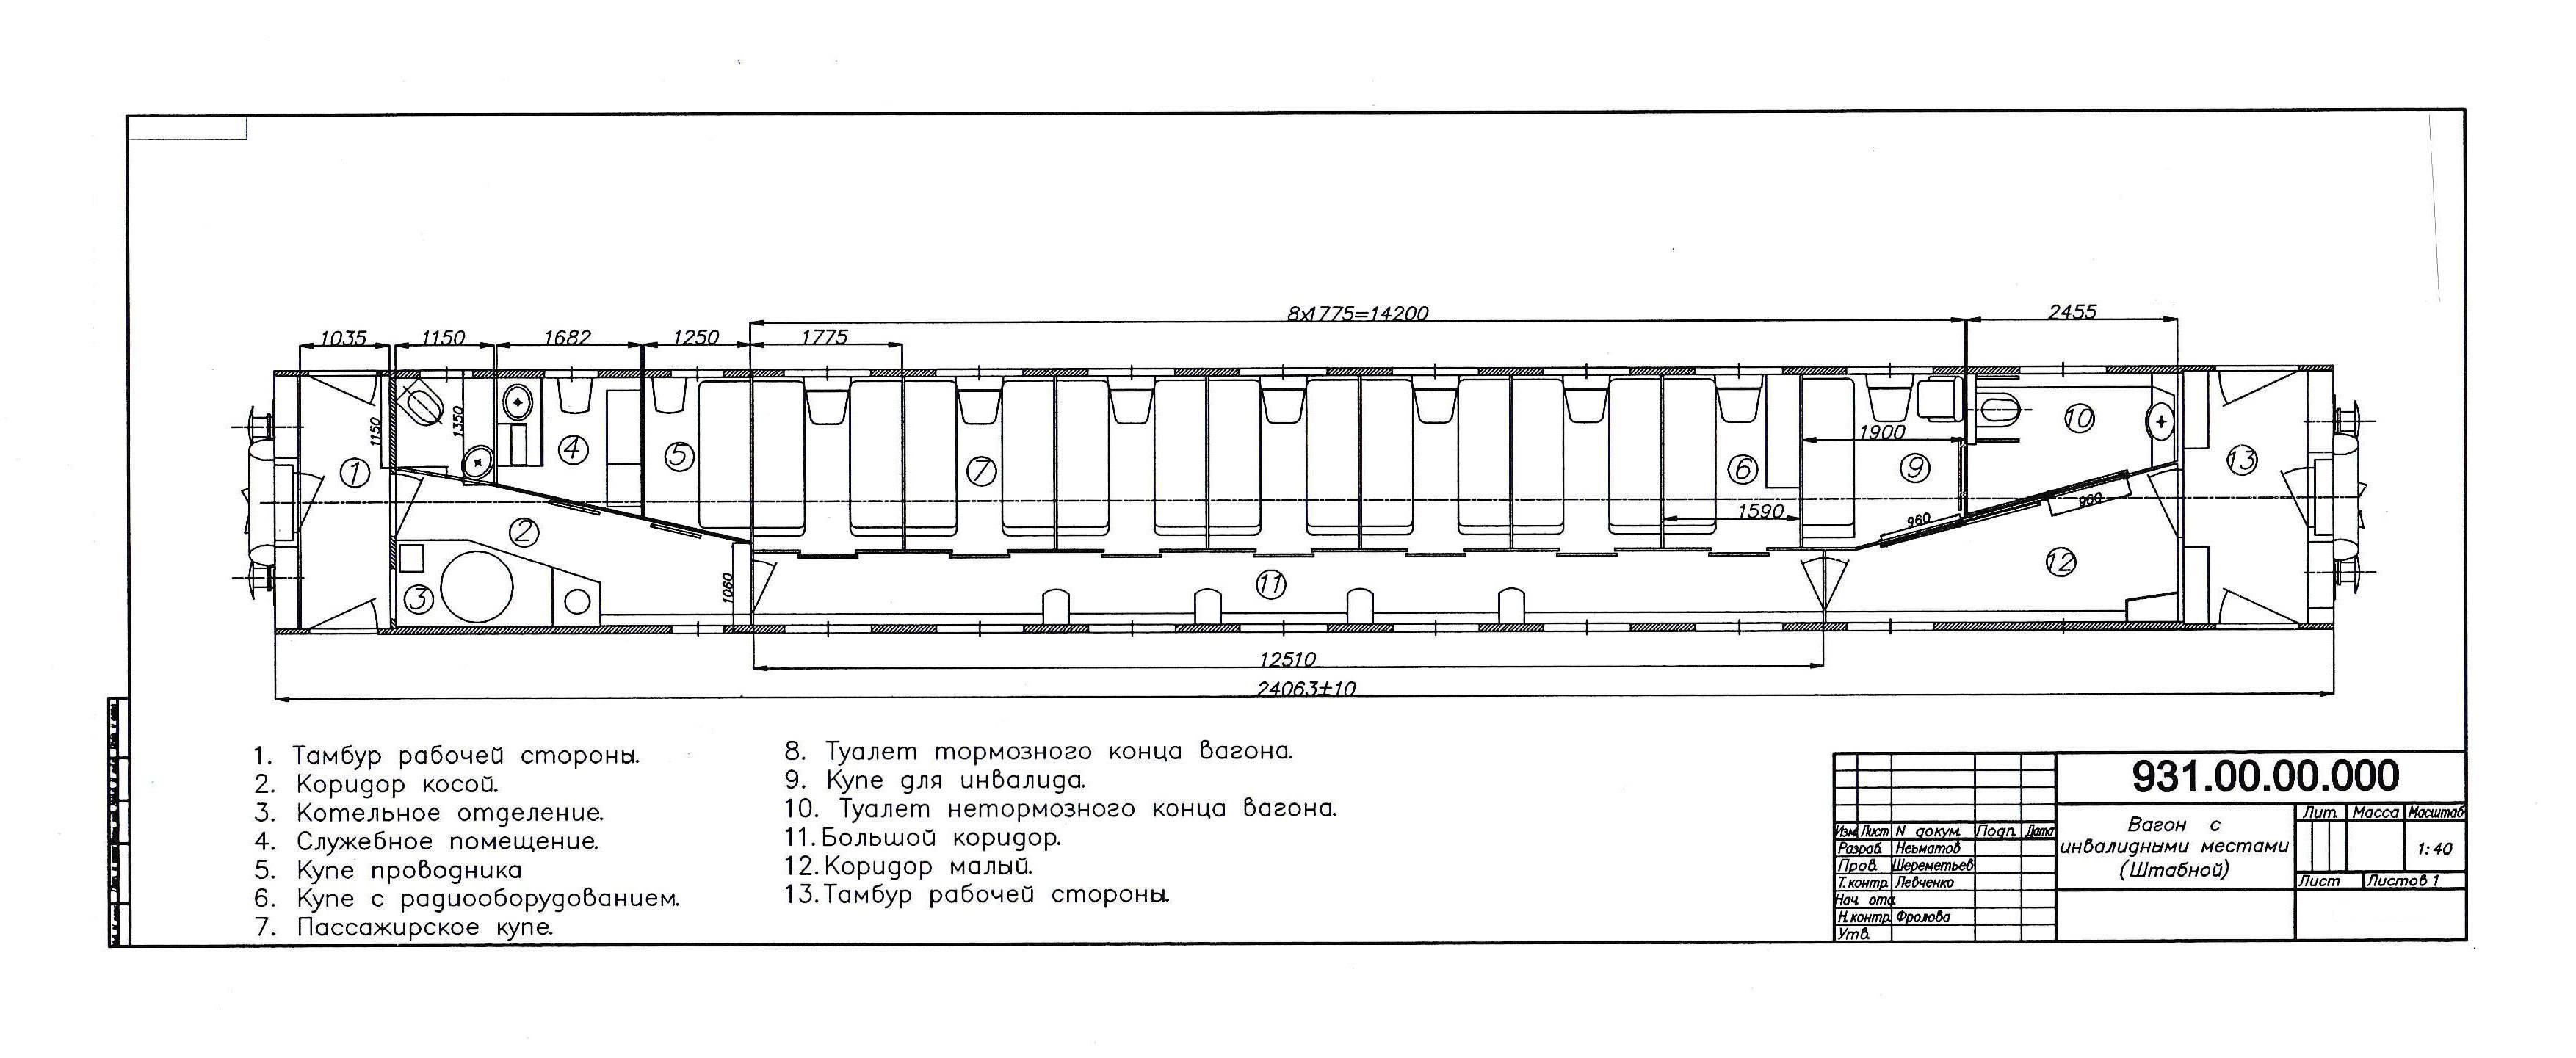 planirovka-vagona-shtabnoj-61-931 (1)